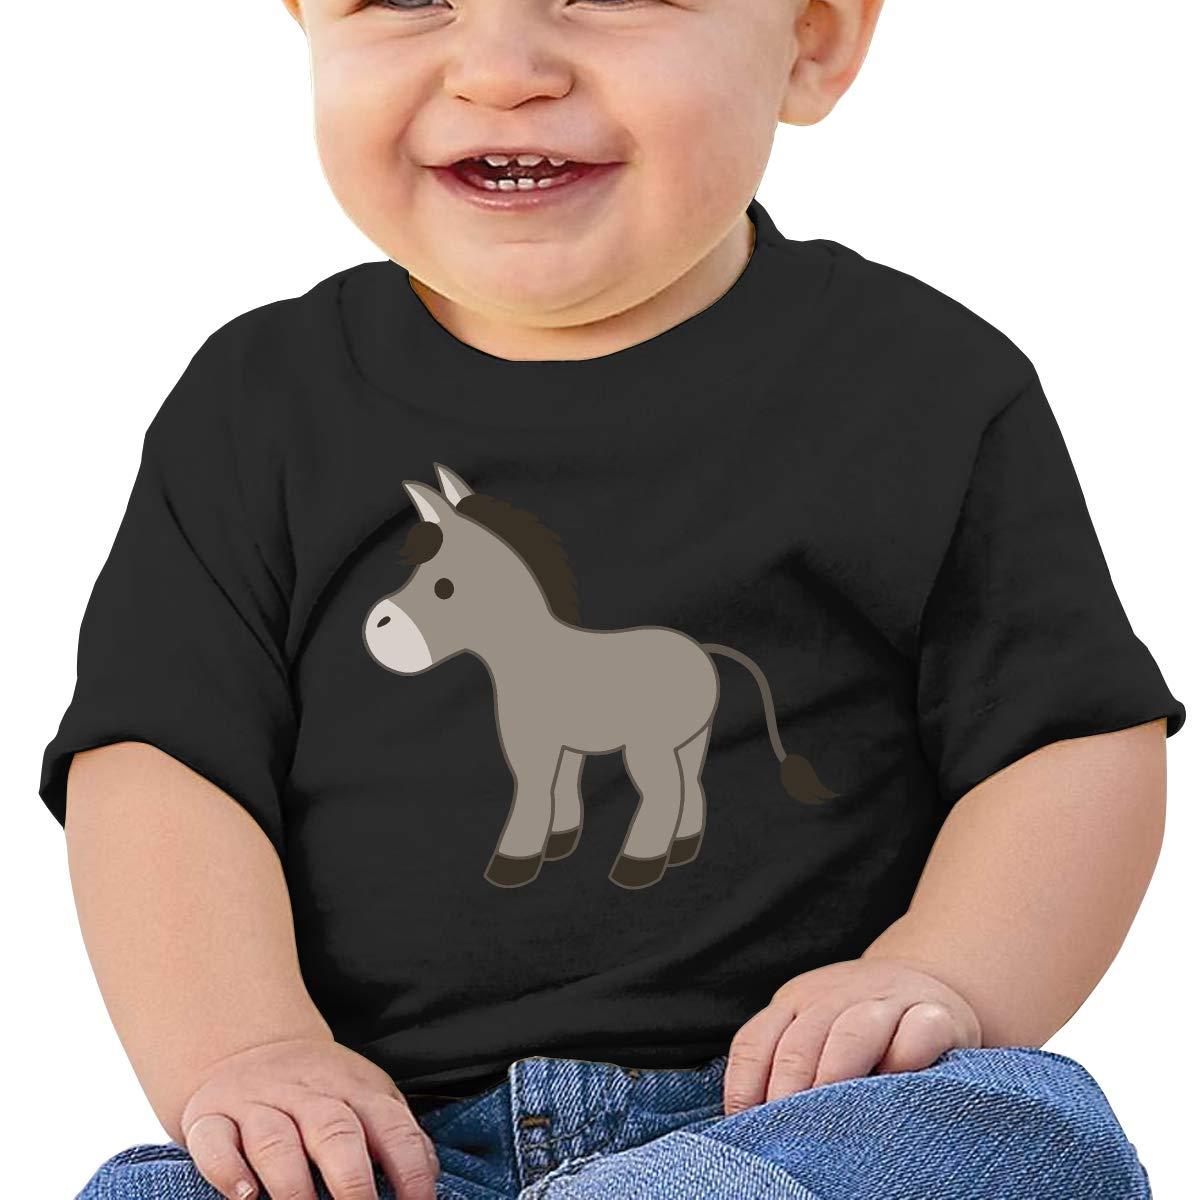 ZUGFGF-S3 Cartoon Donkey Newborn Baby Newborn Short Sleeve Tee Shirt 6-24 Month Cotton Tops